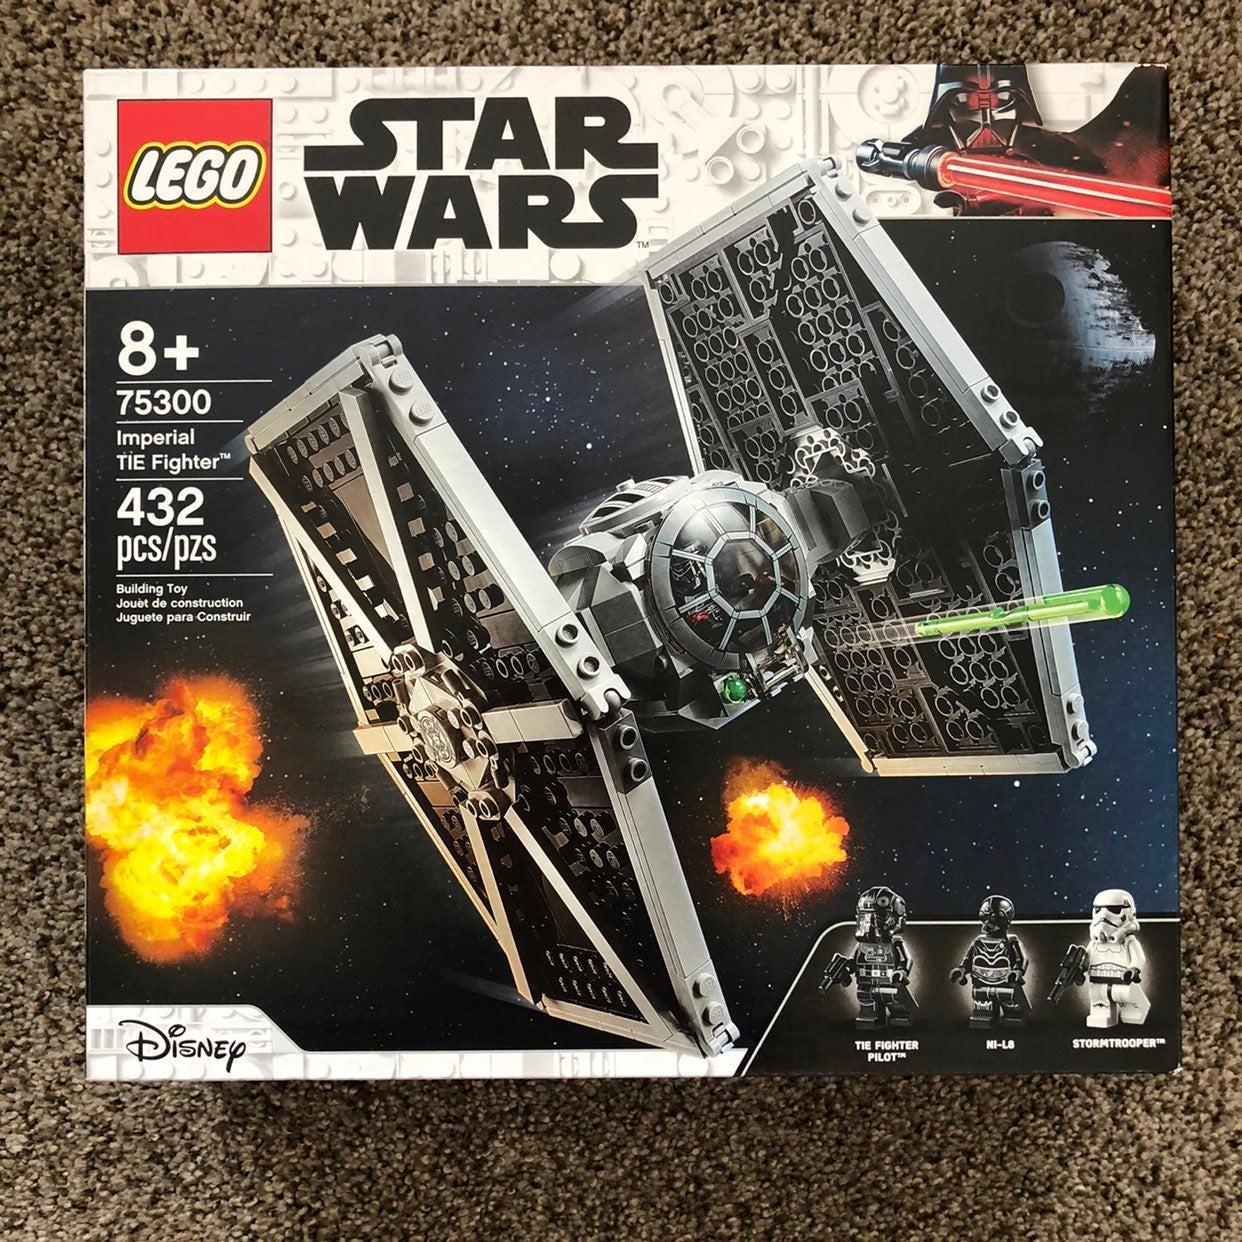 LEGO Star Wars Imperial TIE Fighter 7530